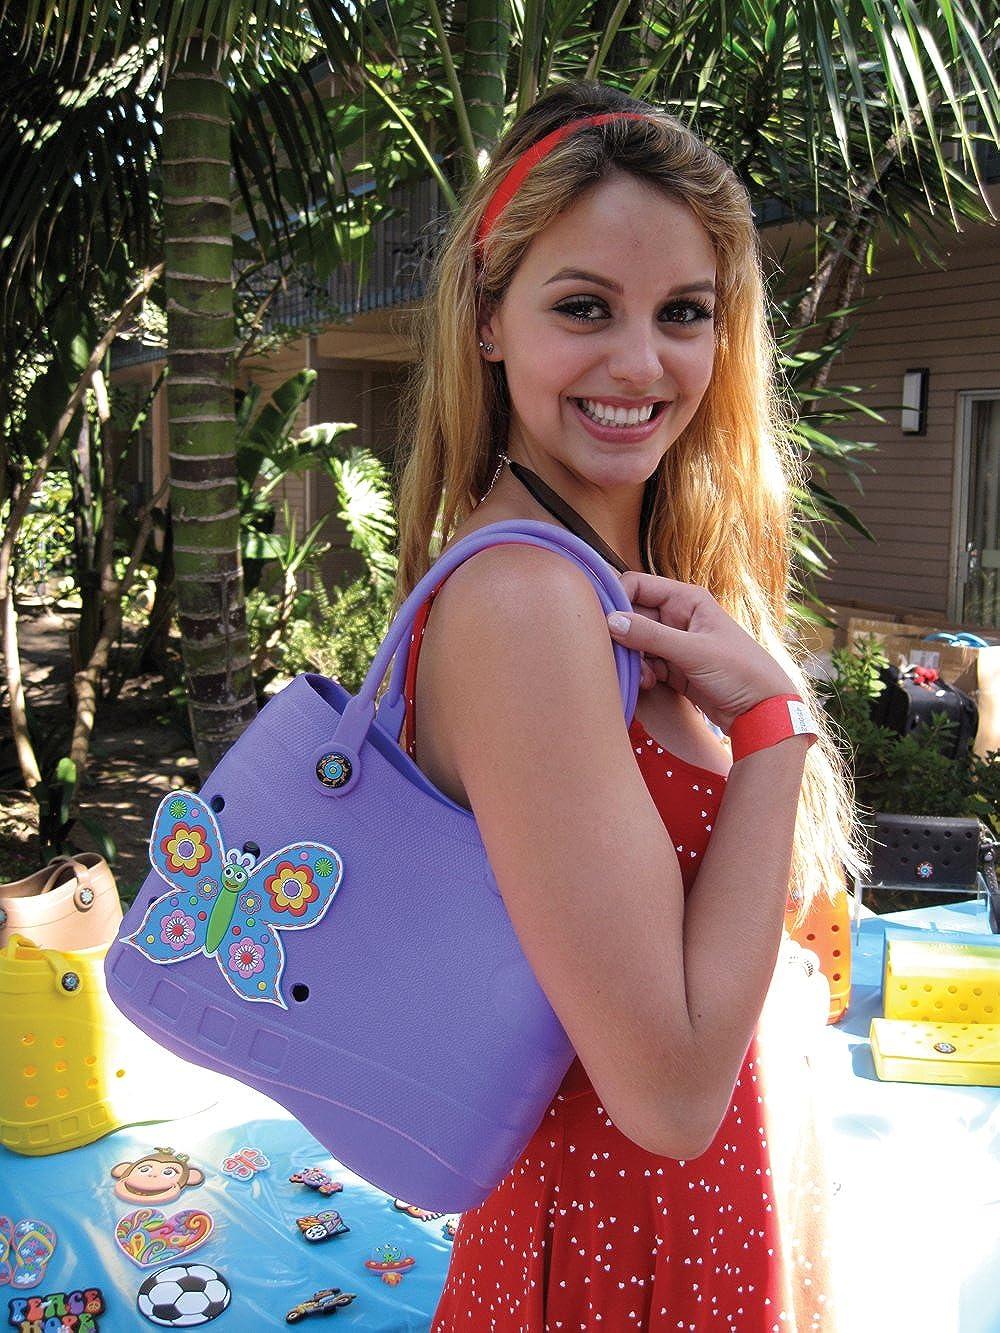 Durable Hand Bag Optari Sol Tote Comfortable Lightweight Girl/'s or Mom Purse Beach Bag